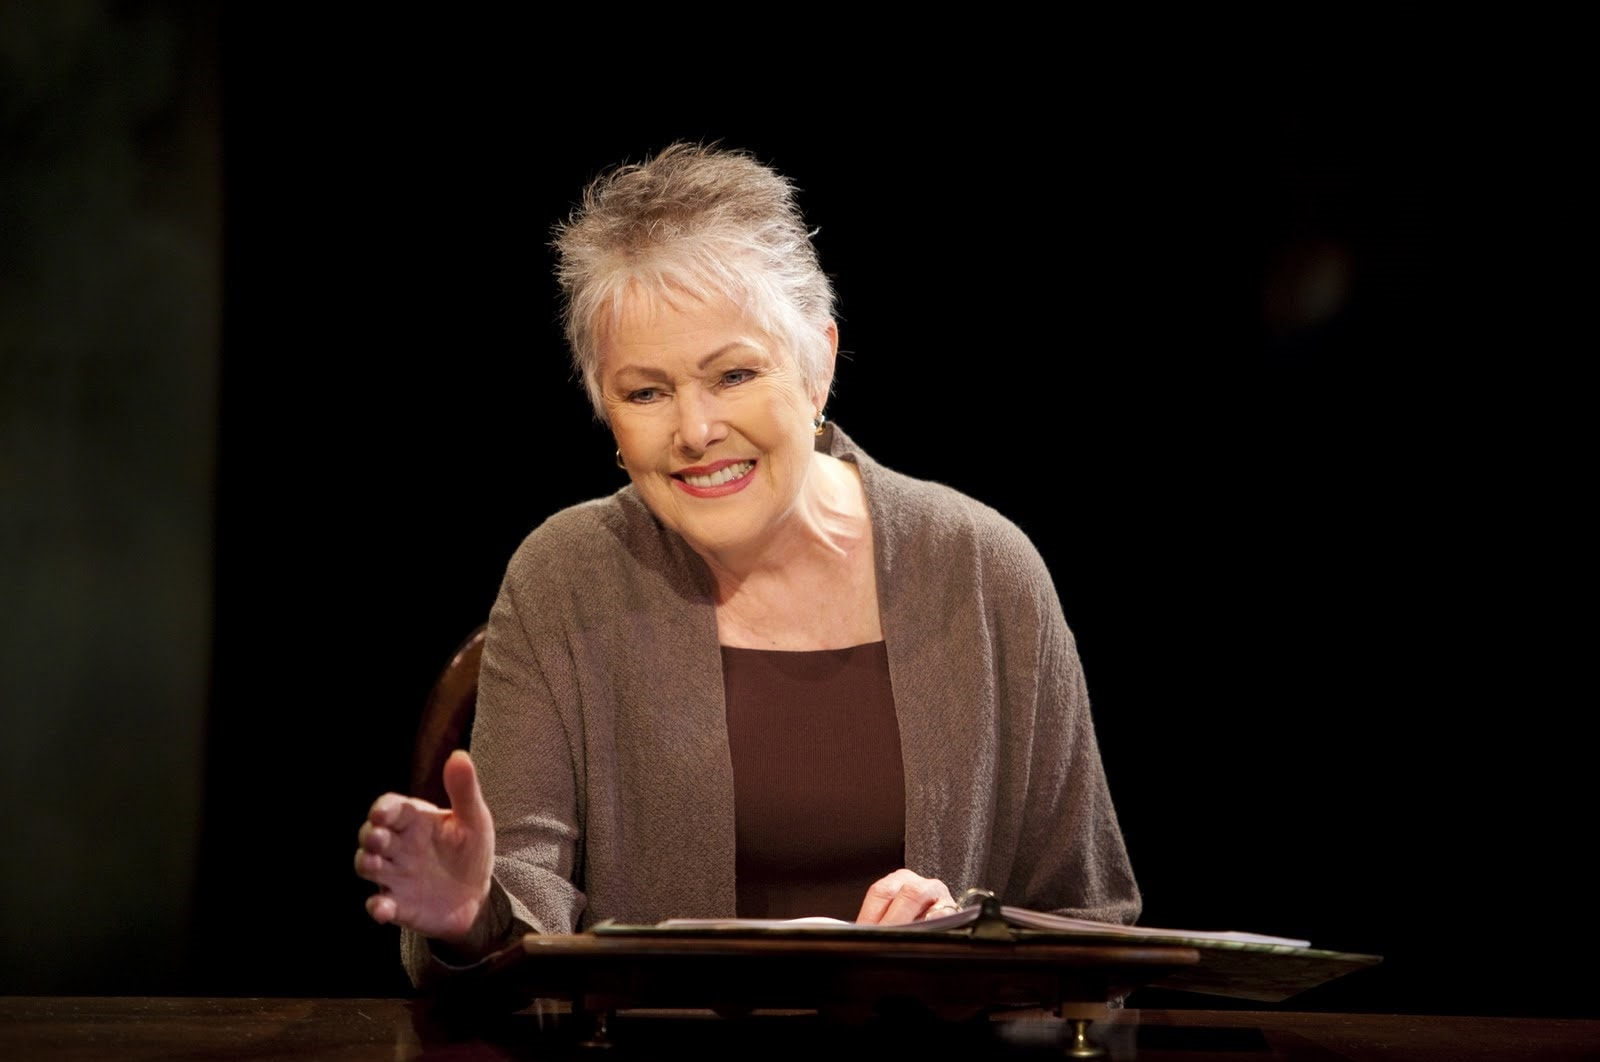 Lynn Redgrave Widescreen